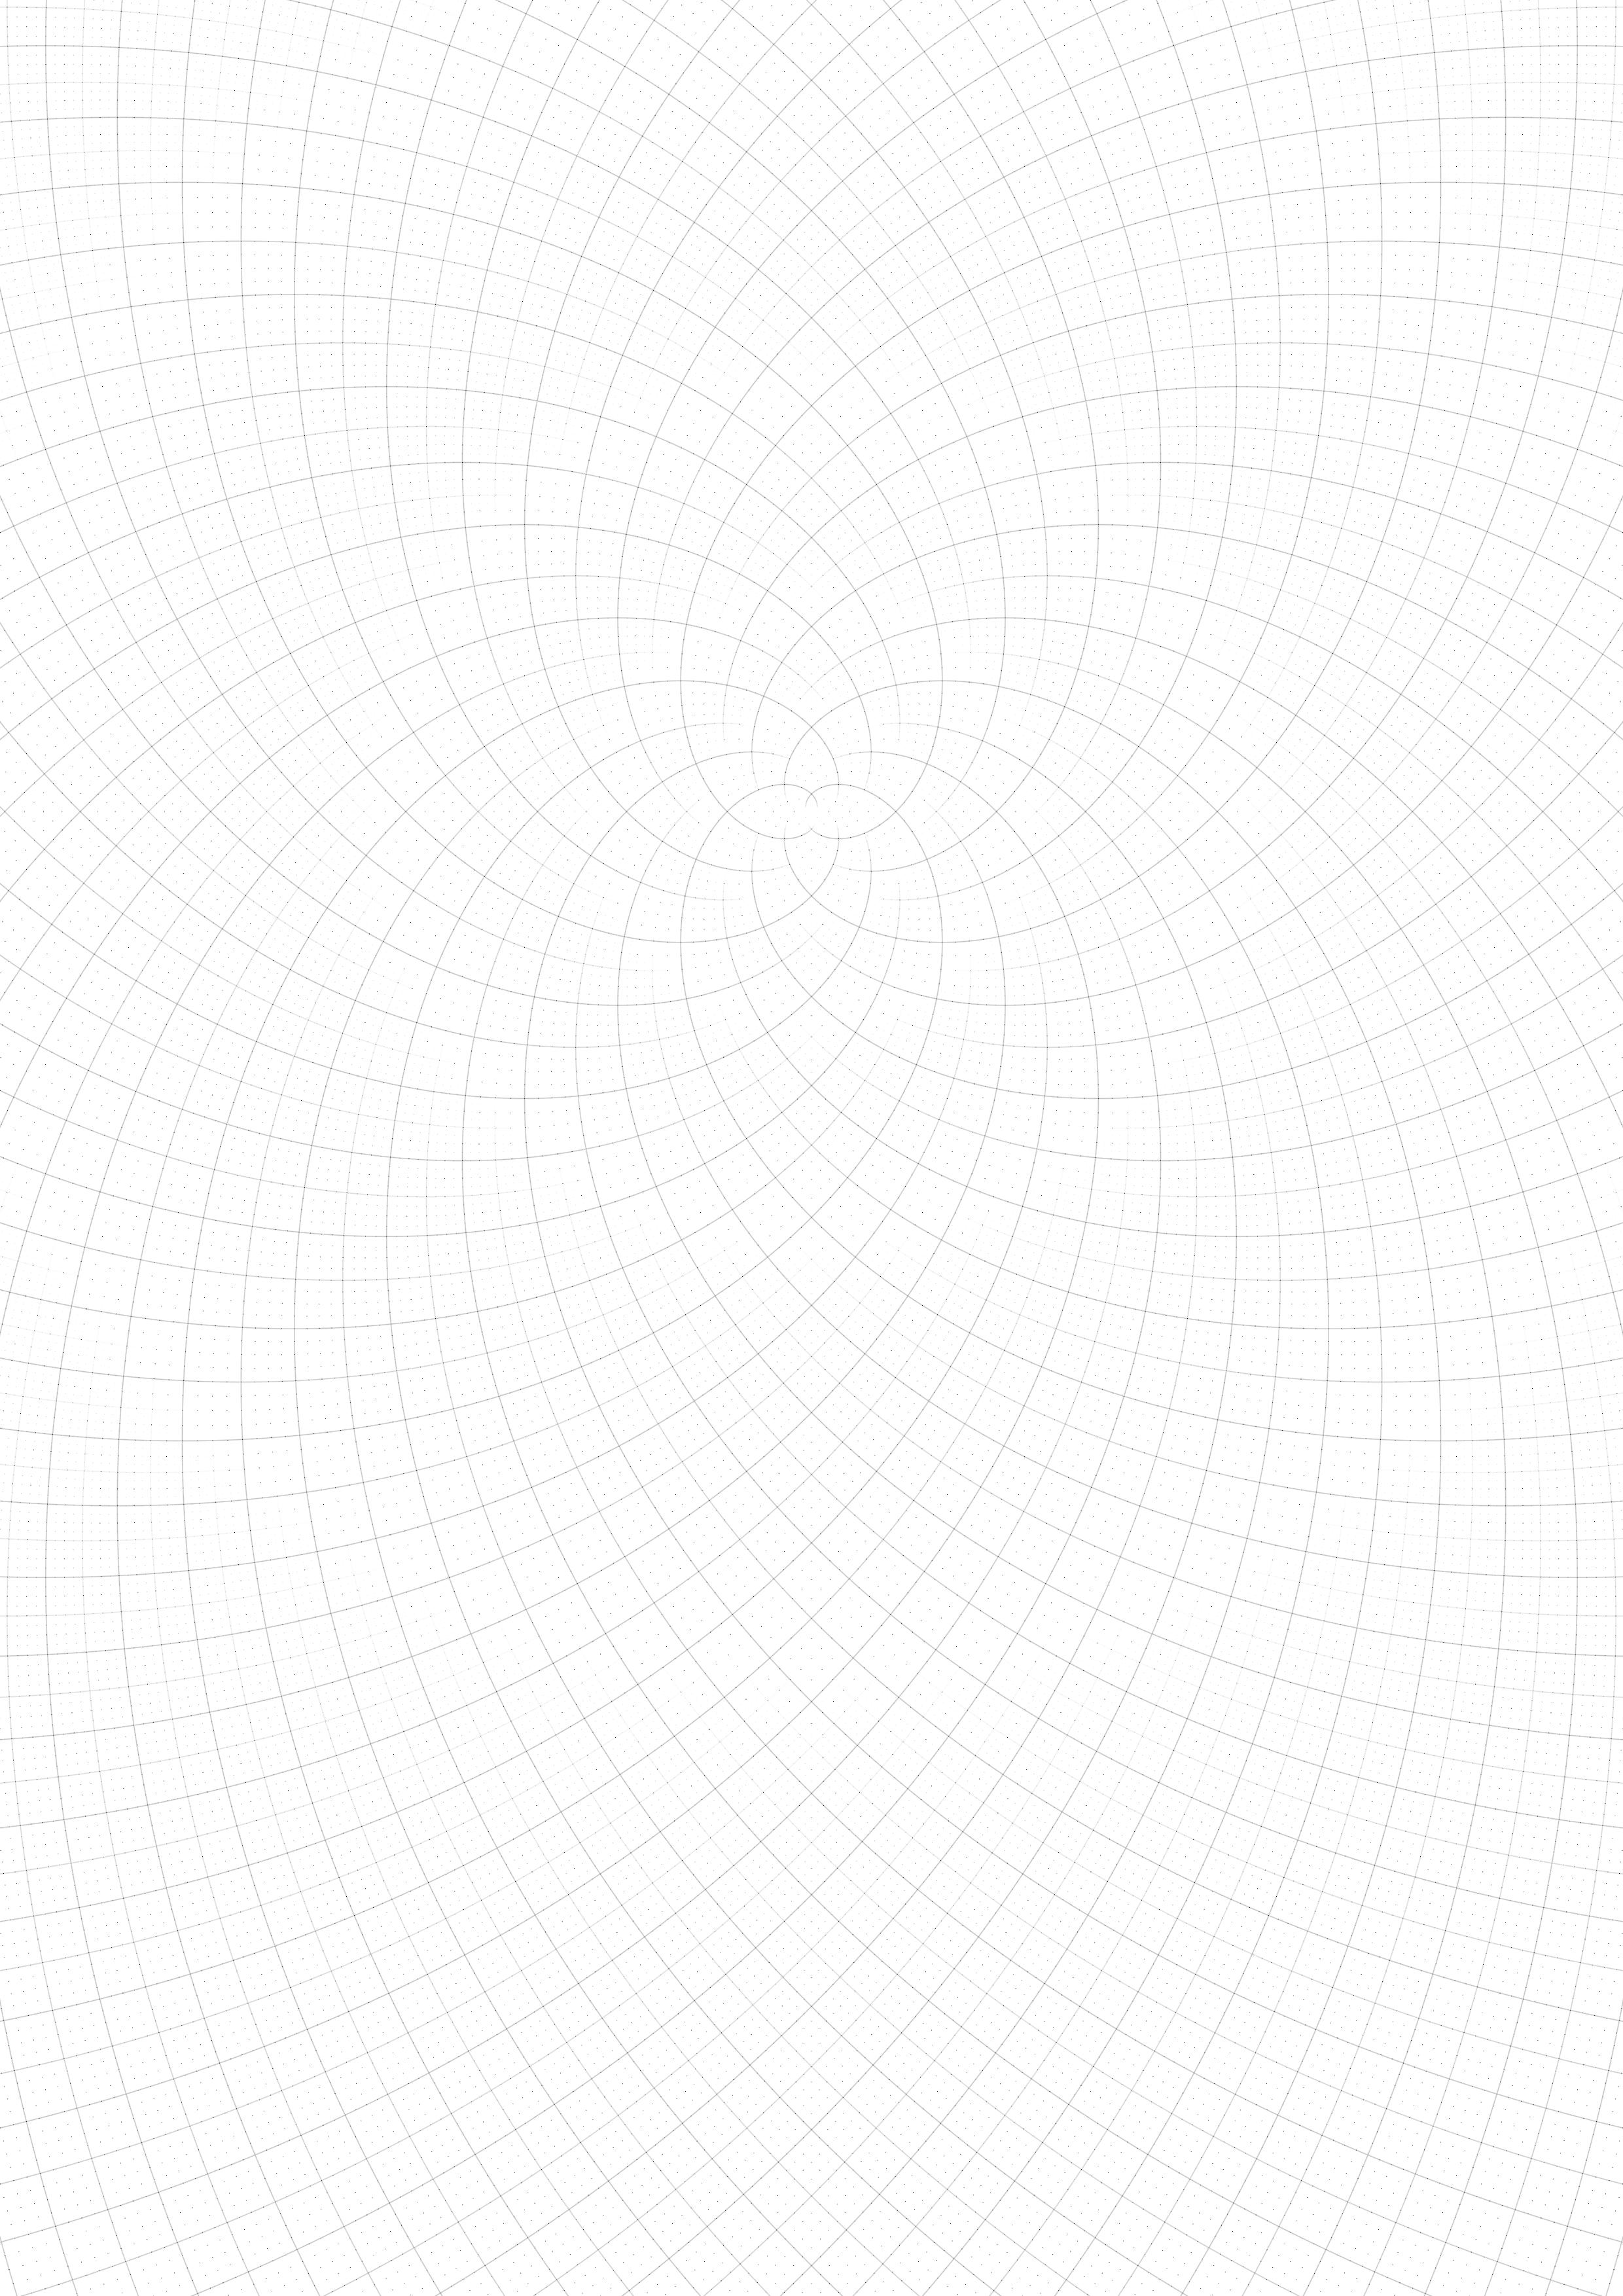 1 8 graph paper juve cenitdelacabrera co